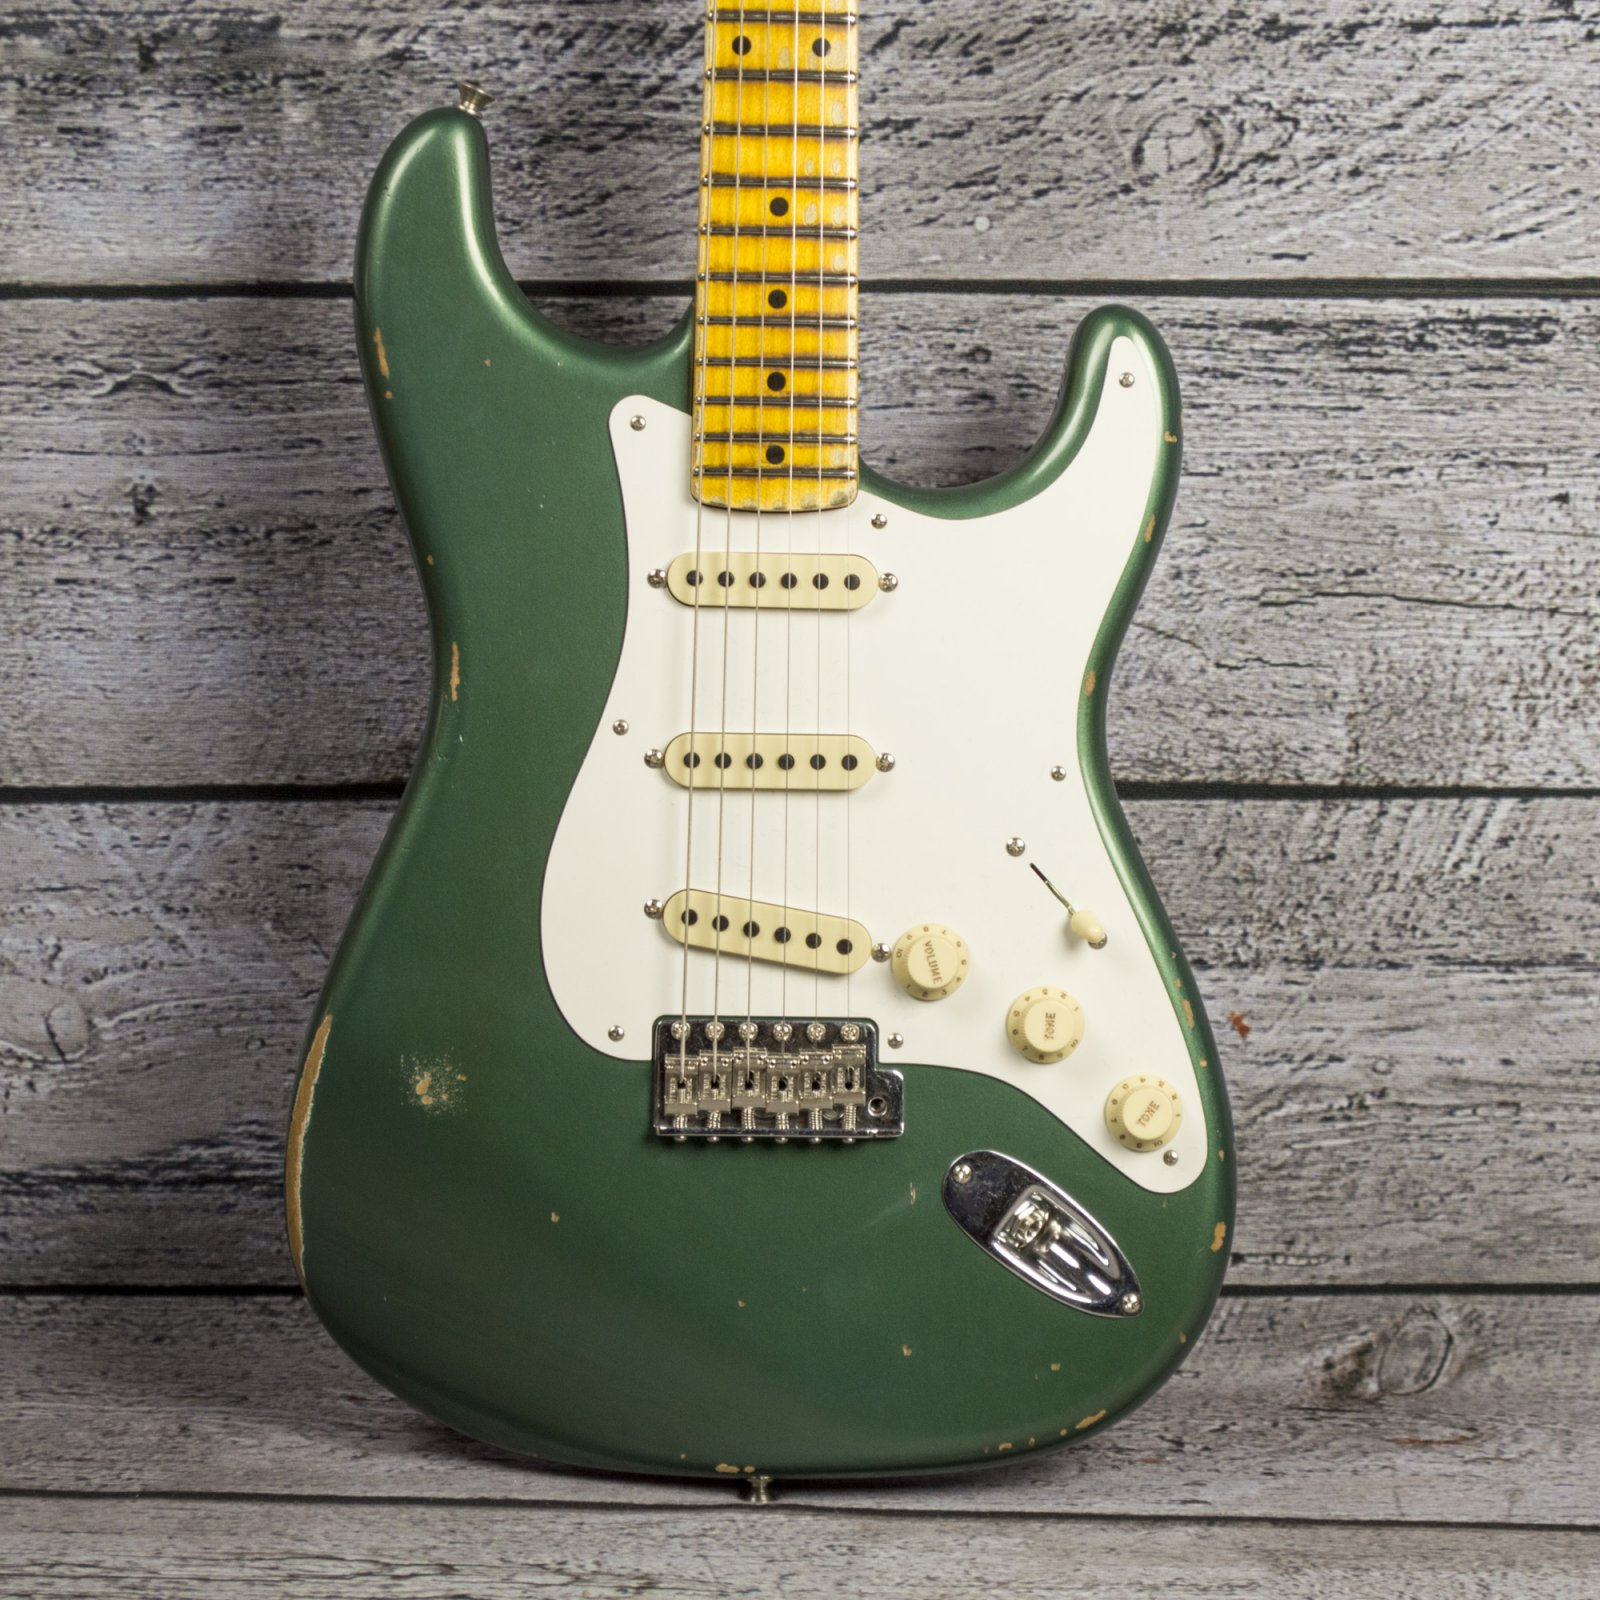 Fender Custom Shop 1956 Stratocaster Relic - Aged Sherwood Green Metallic